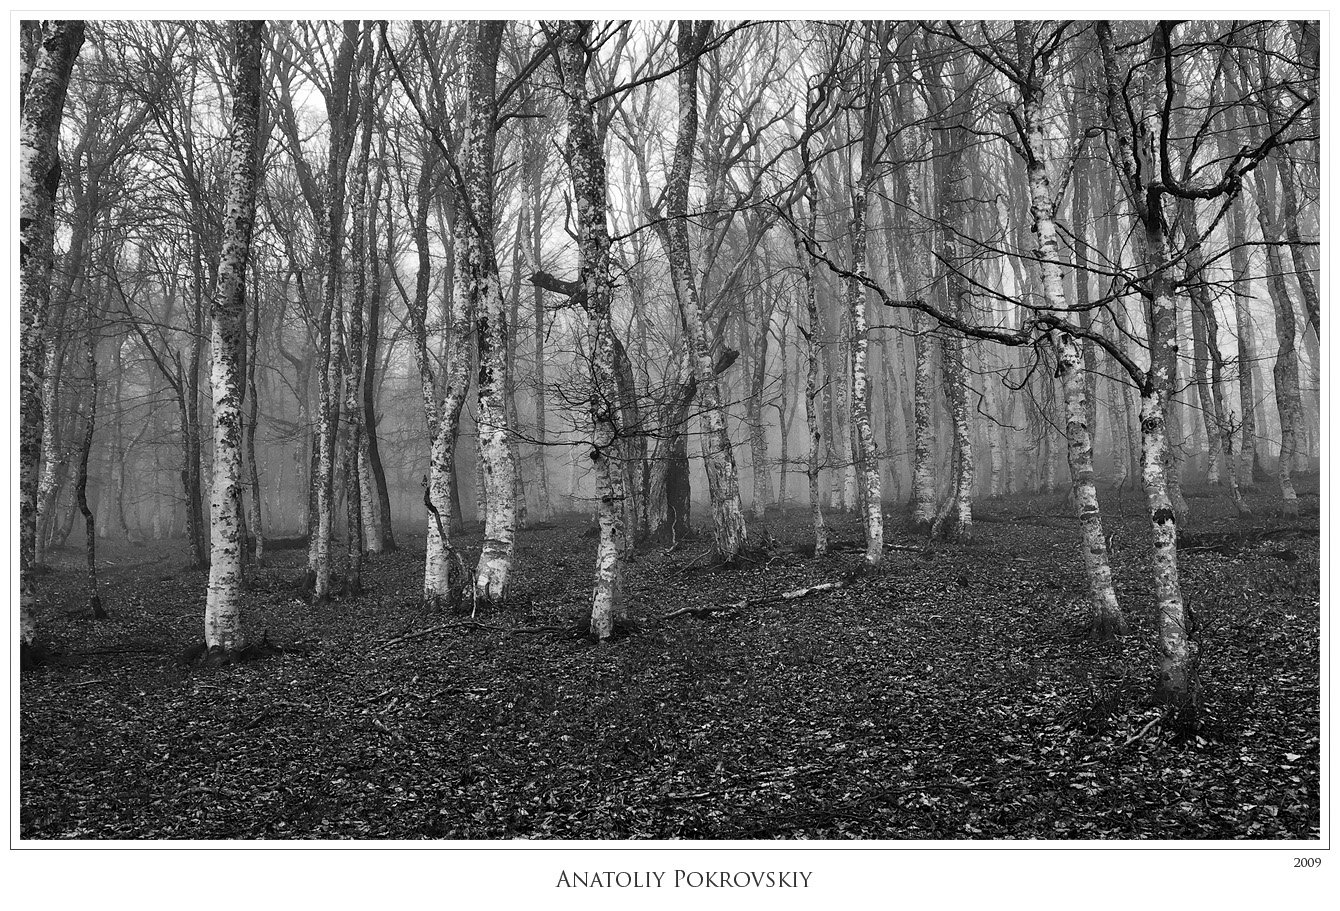 крым, горы, туман, лес, бук, берёза, осина, весна, анатолий покровский, Анатолий Покровский